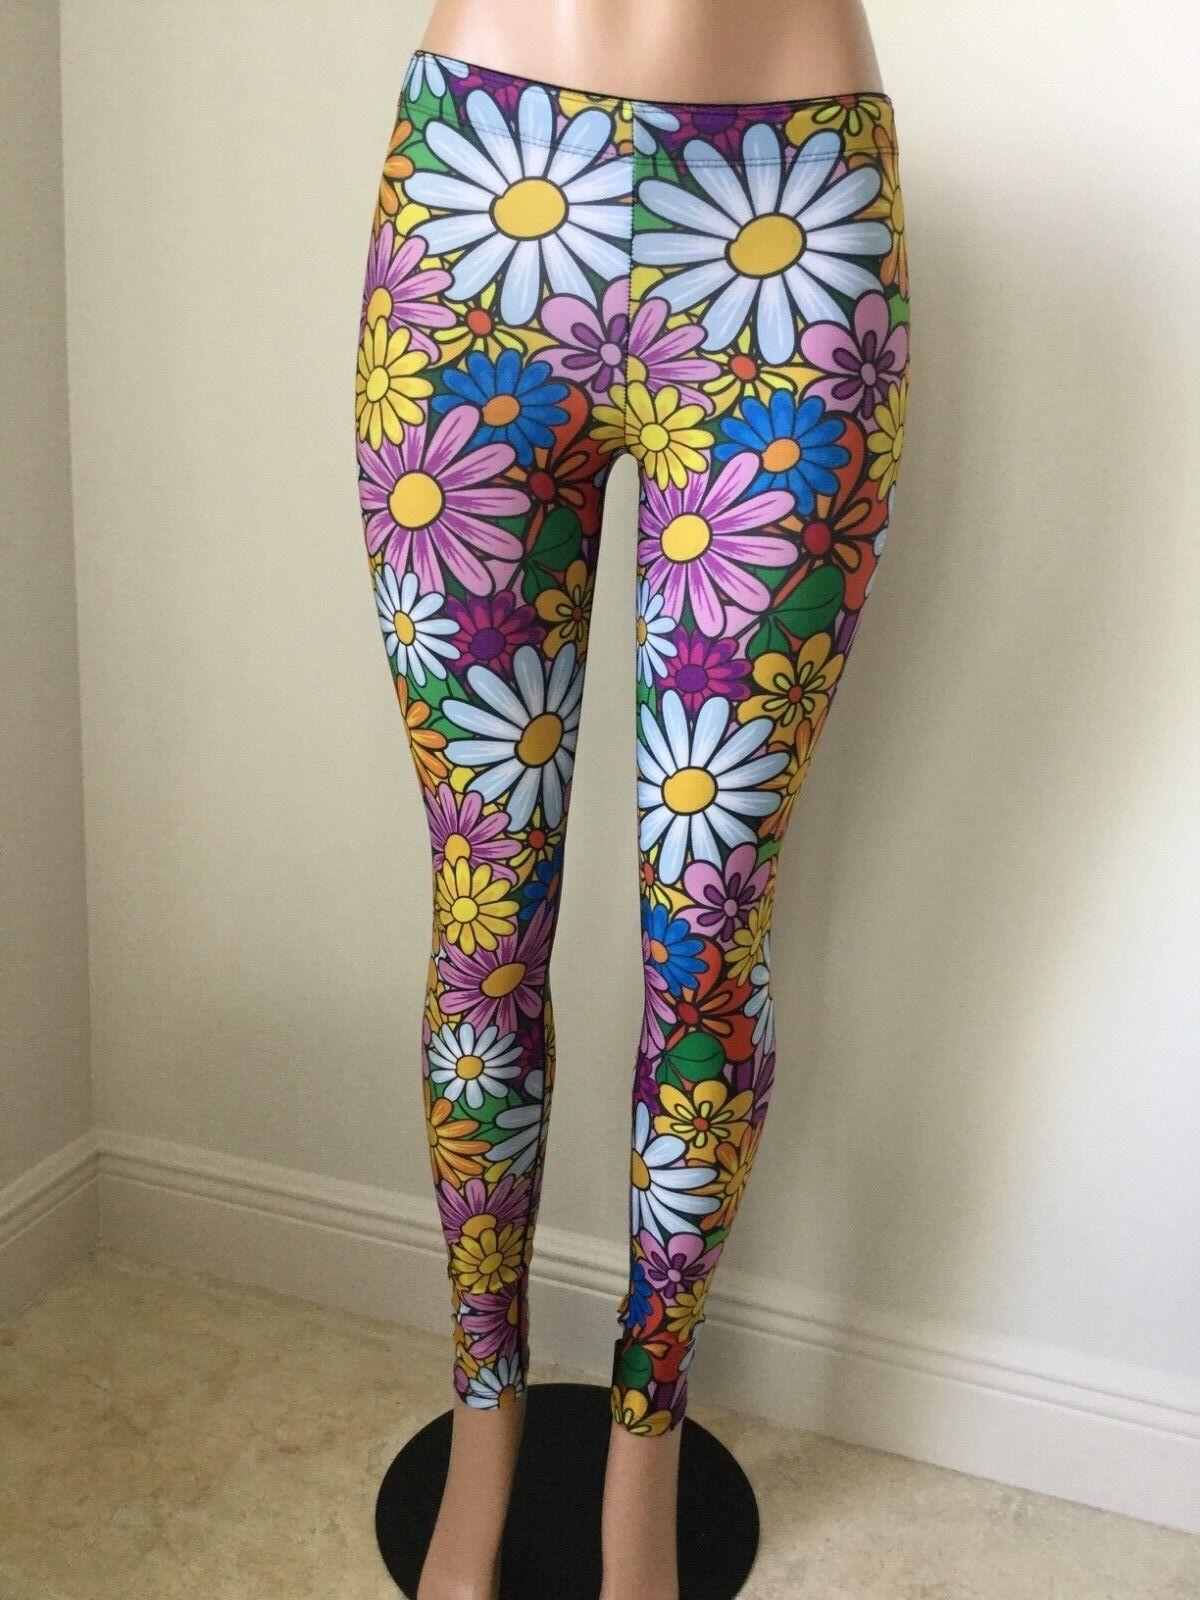 Bia fitness active wear colombian women's Brazil gym yoga pants leggings xs-s